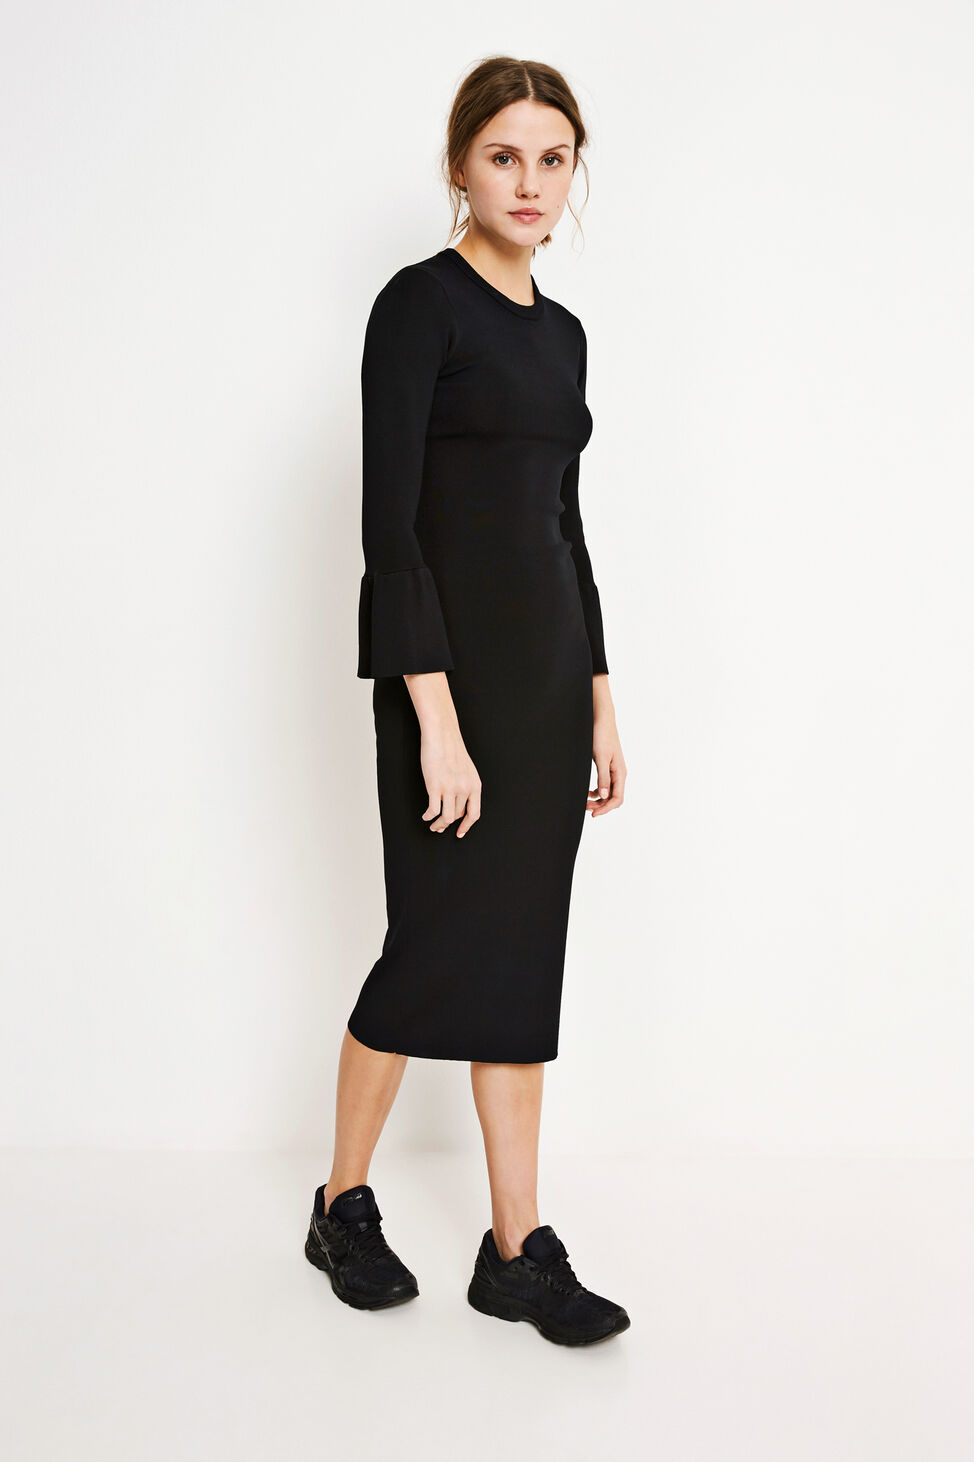 ENSPRINKLE 3/4 DRESS 5180